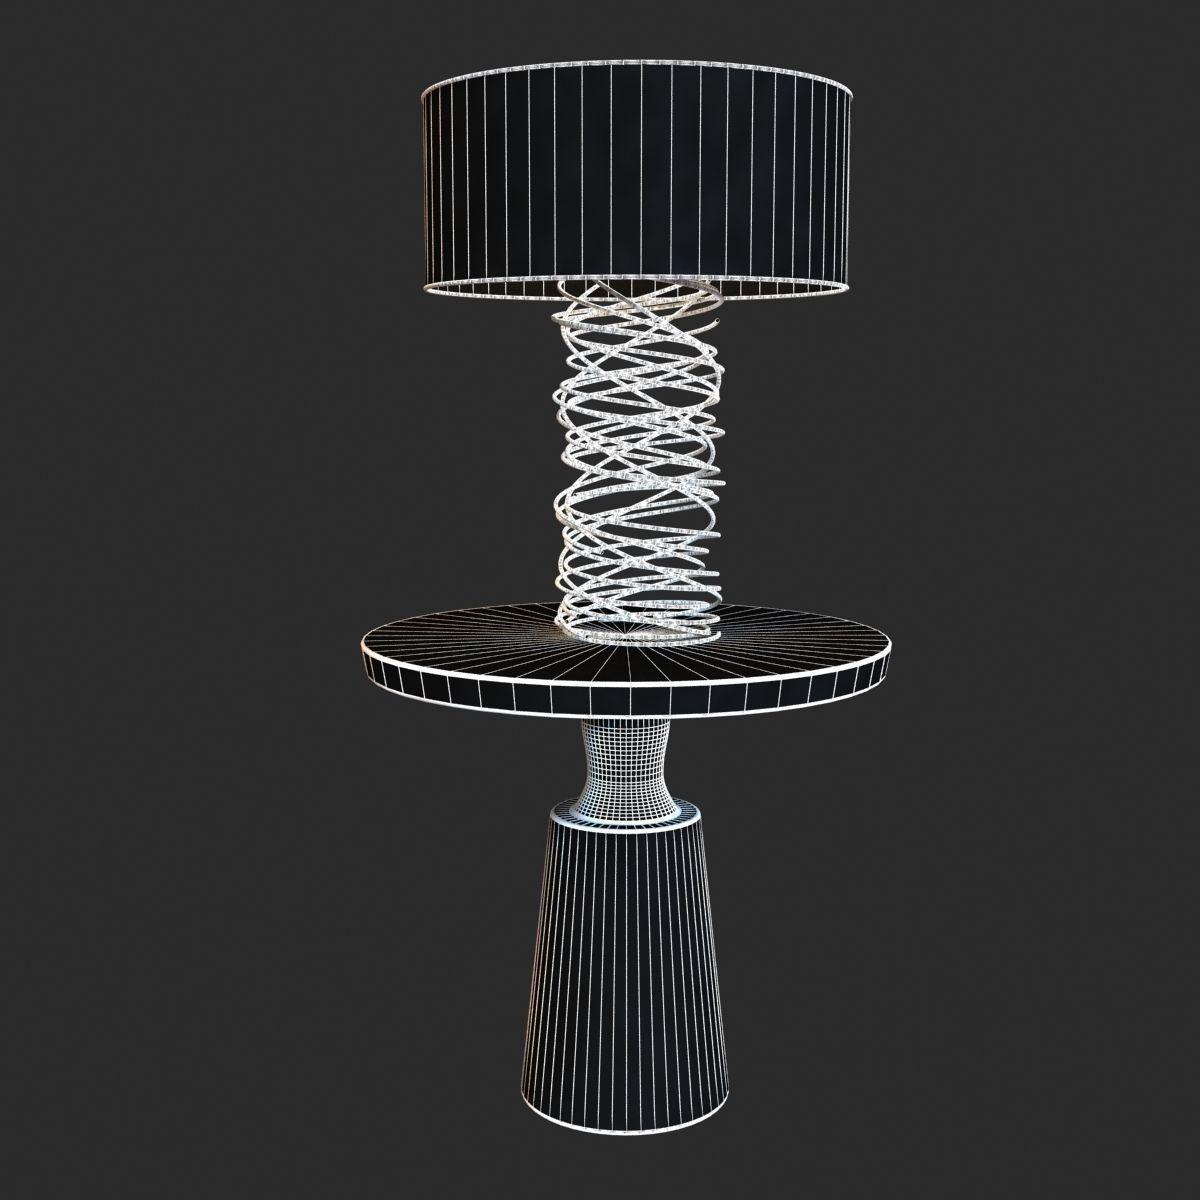 ... ralph pucci table lighting tornado l& 3d model max obj 3ds fbx mtl 7 ... & 3D model Ralph Pucci Table Lighting Tornado lamp